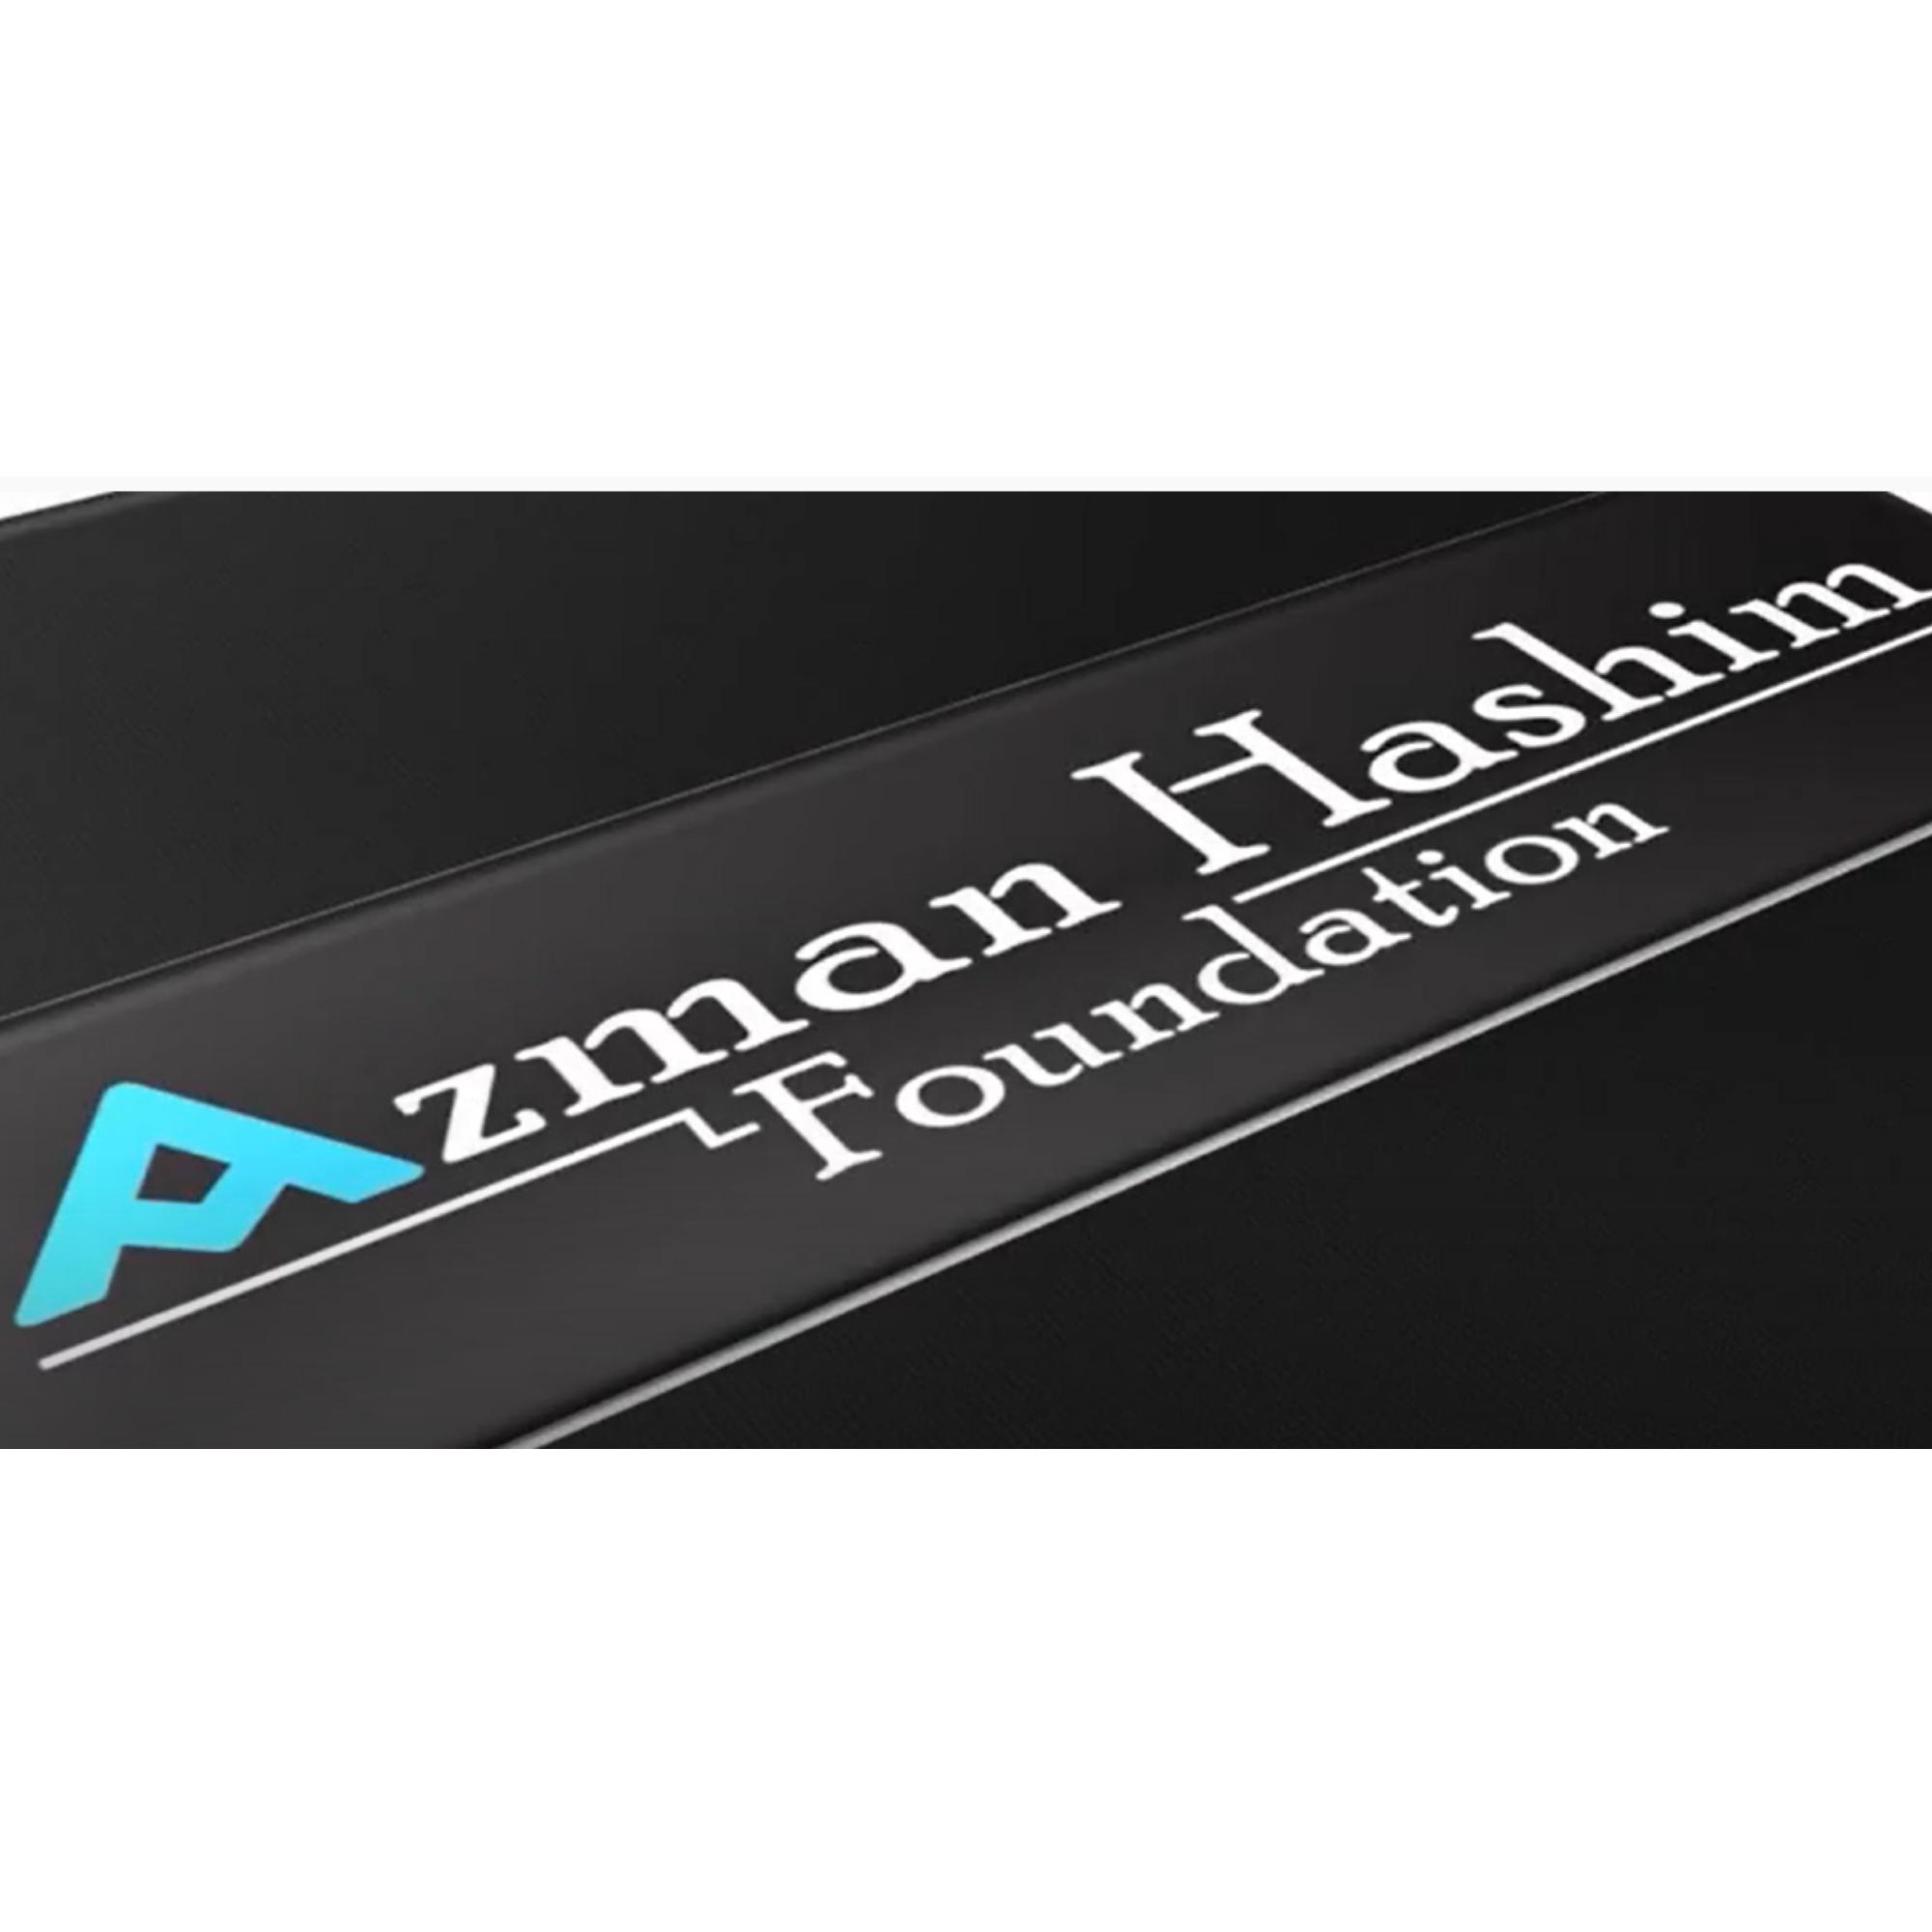 Read more about the article Tan Sri Azman Hashim's CSR Initiatives